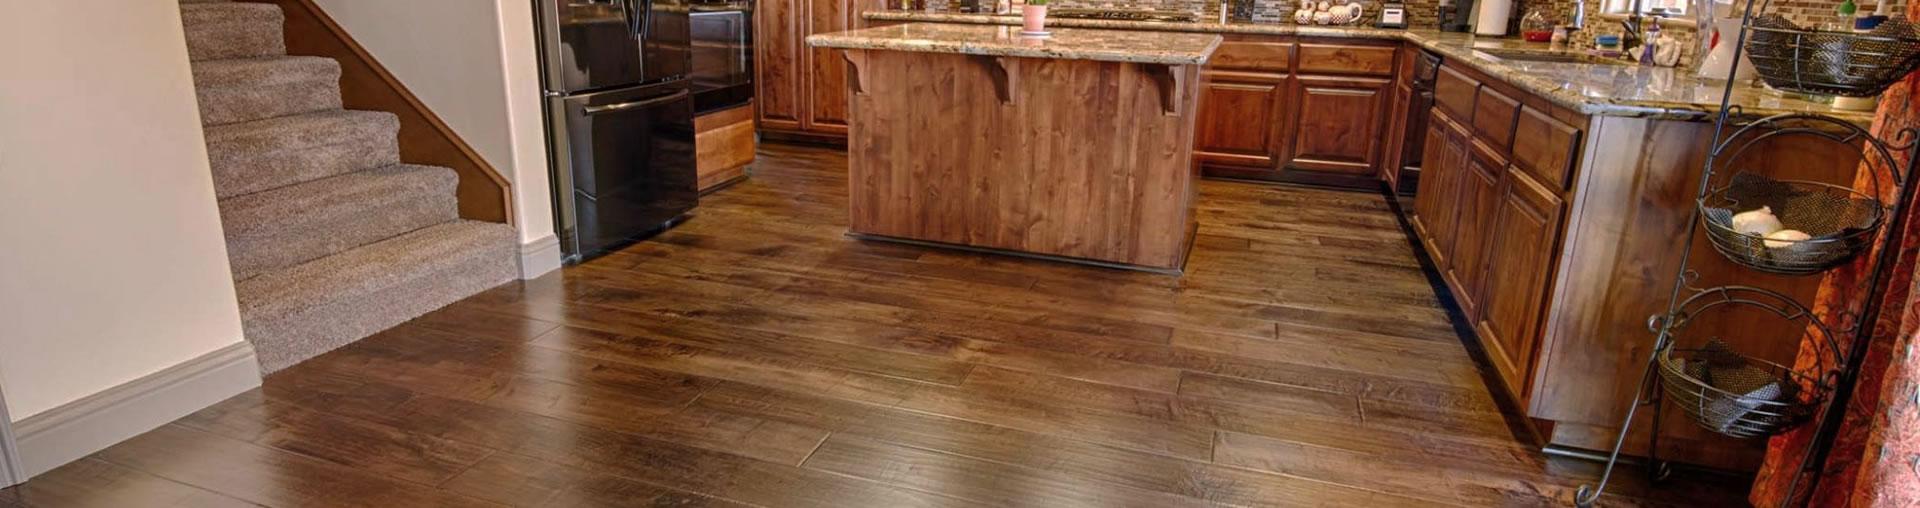 durable hardwood flooring most durable laminate flooring most durable laminate KRDPNJB